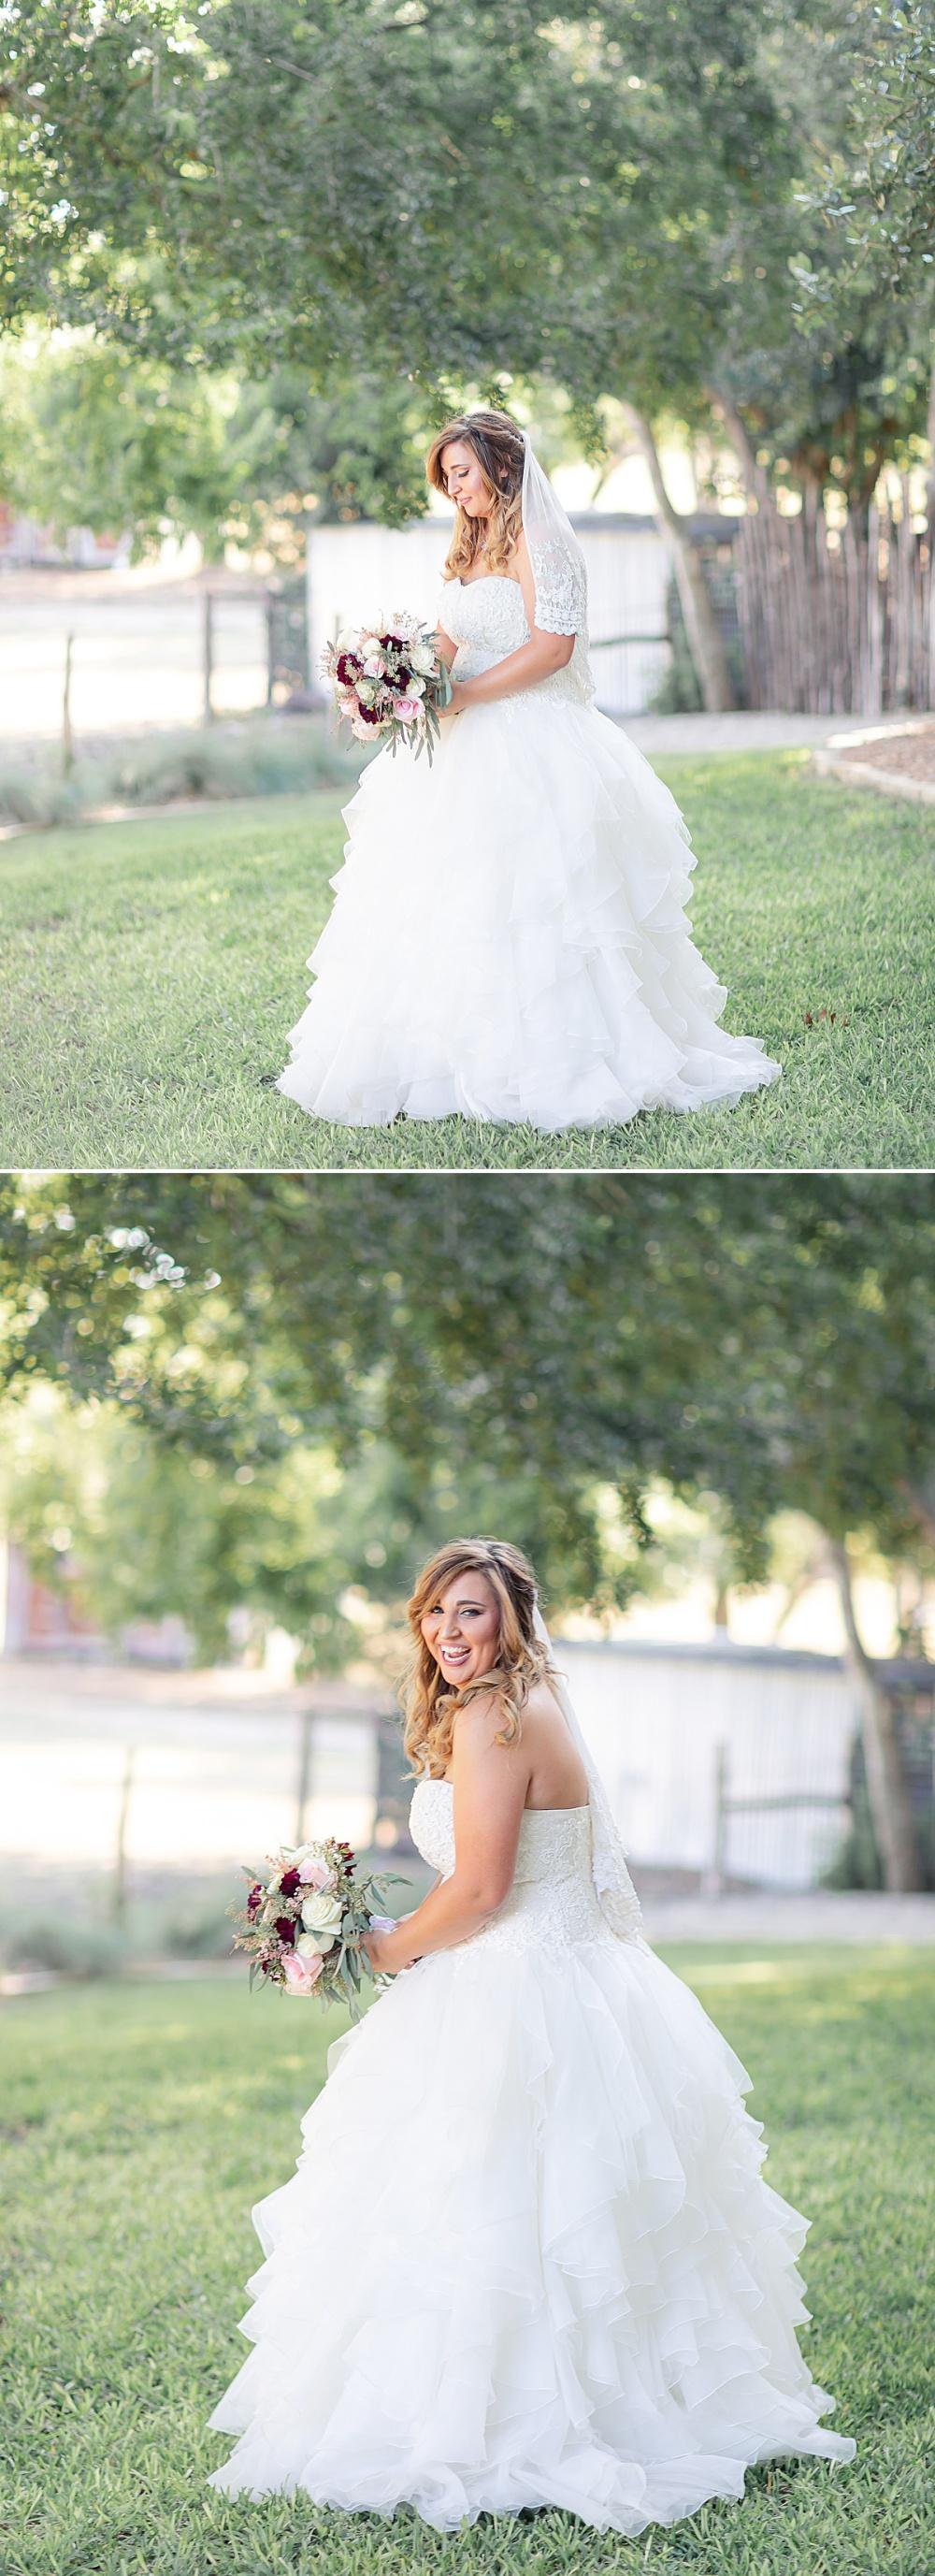 Navy-Burgundy-Texas-Wedding-Gruene-Estate-New-Braunfels-Carly-Barton-Photography_0038.jpg